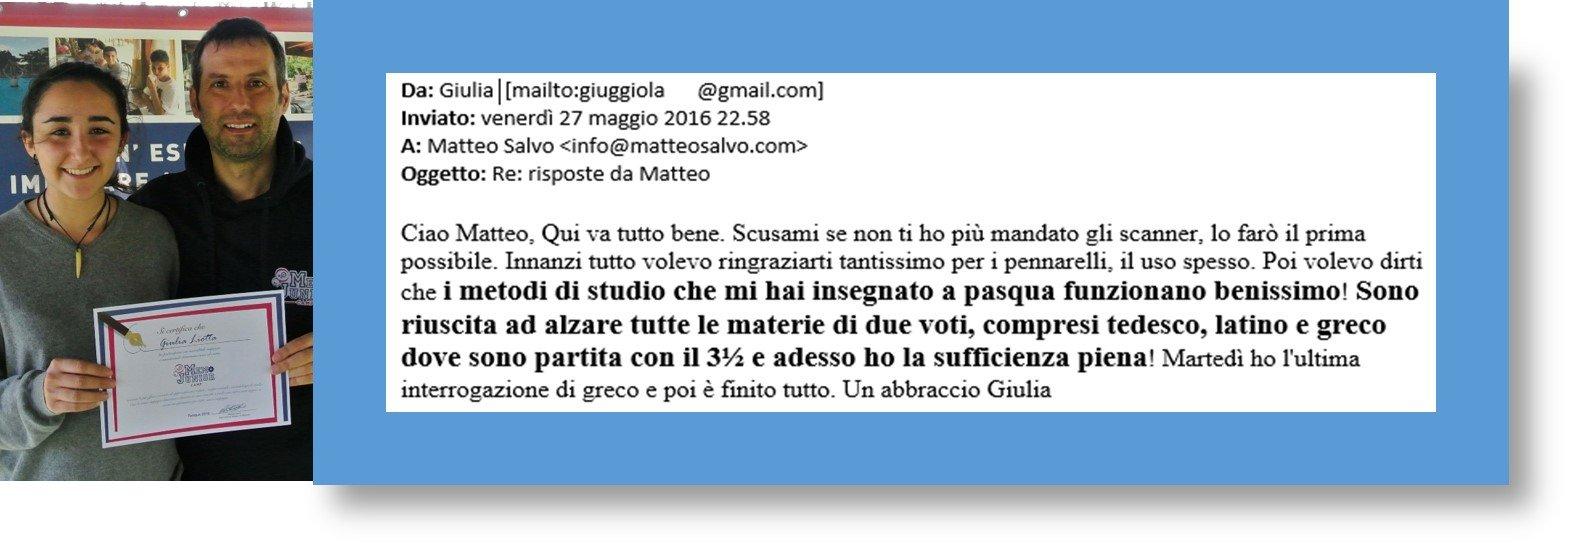 mail11